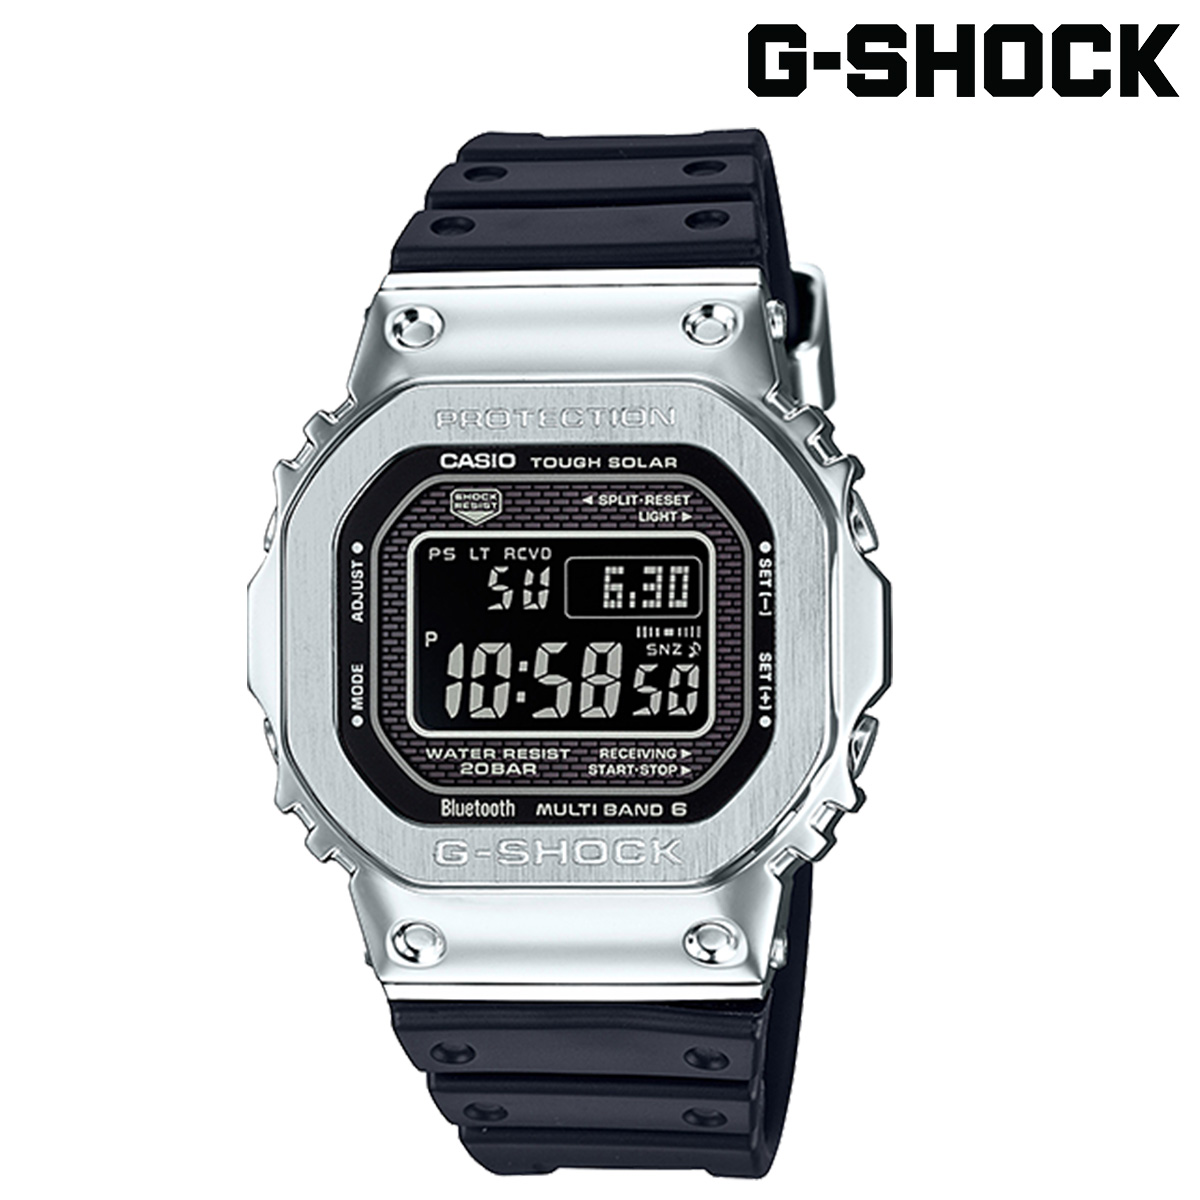 CASIO G-SHOCK カシオ 腕時計 GMW-B5000-1JF ジーショック Gショック G-ショック シルバー メンズ レディース